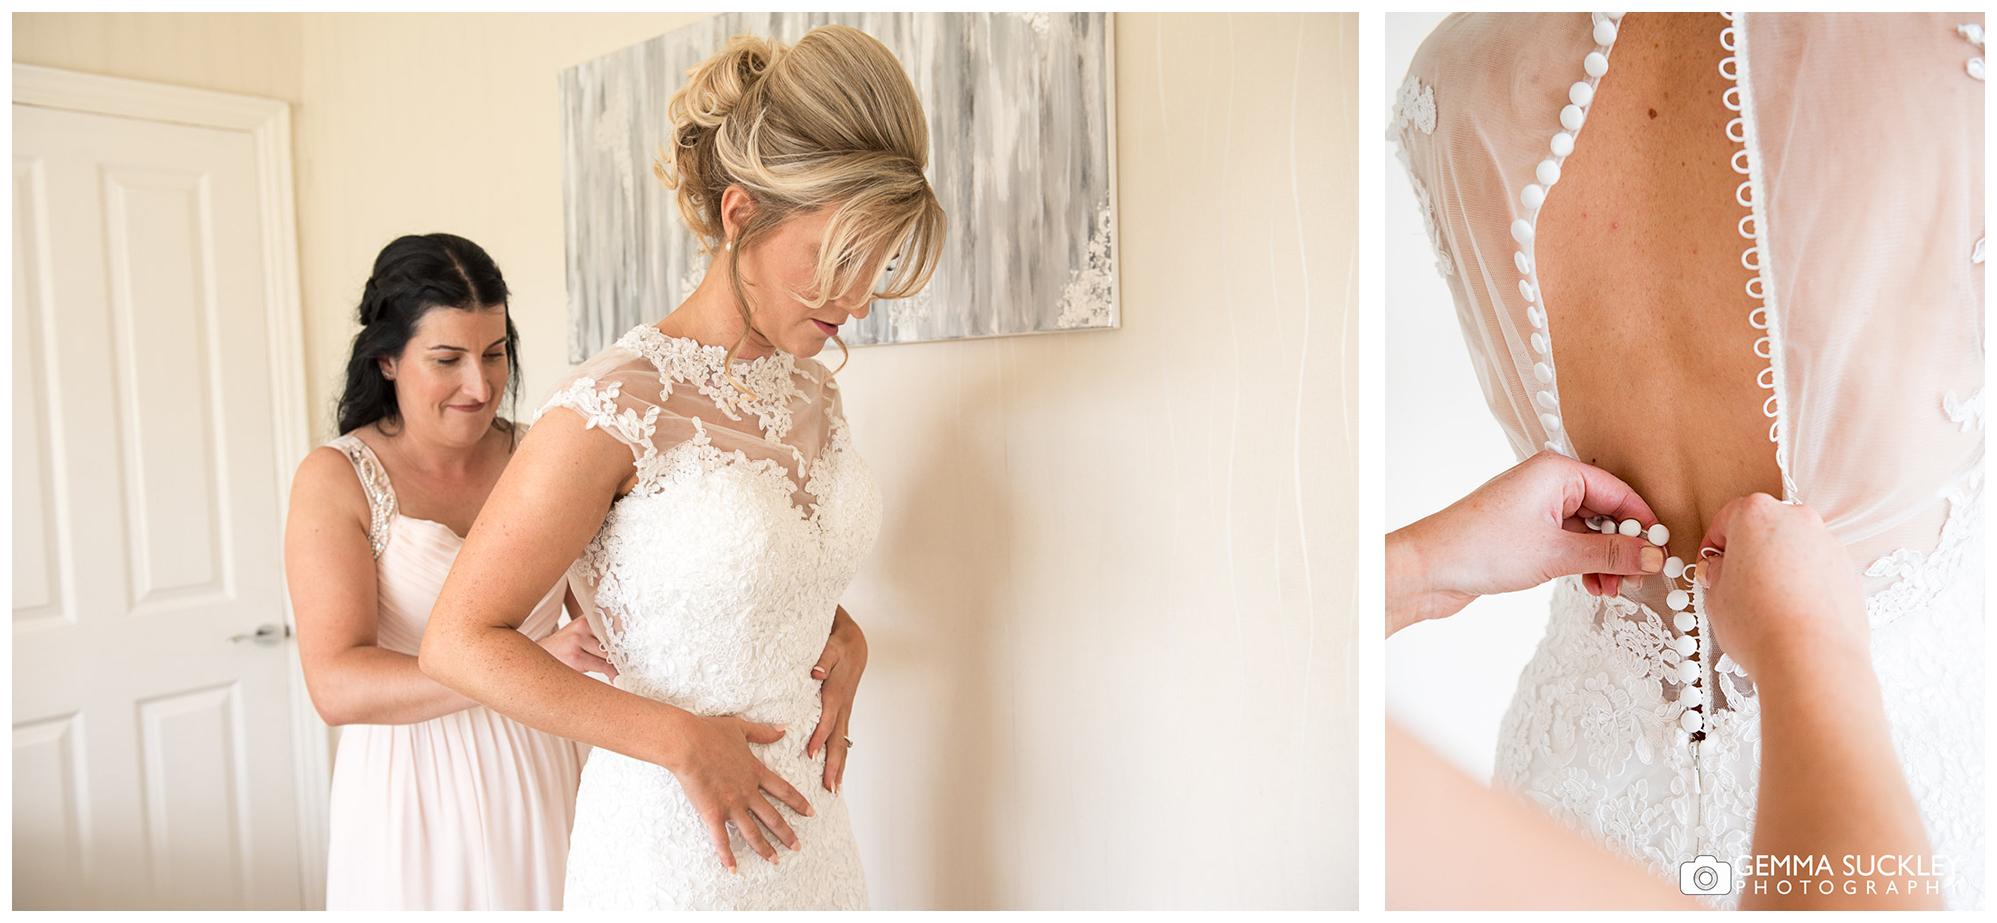 bride-wedding-dress-natual-photography.jpg